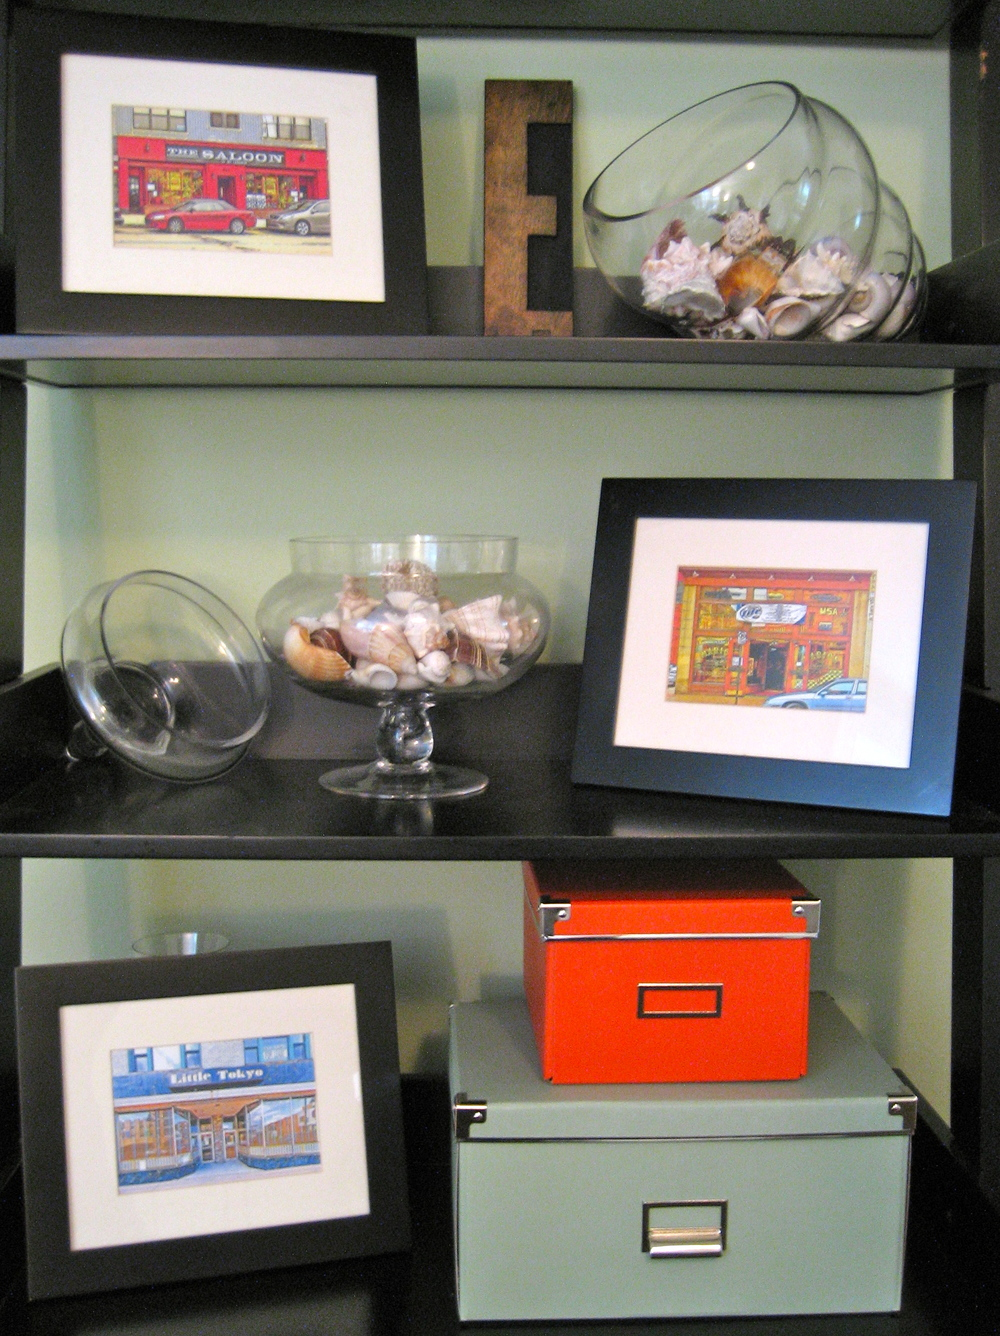 Decorating a Bookshelf